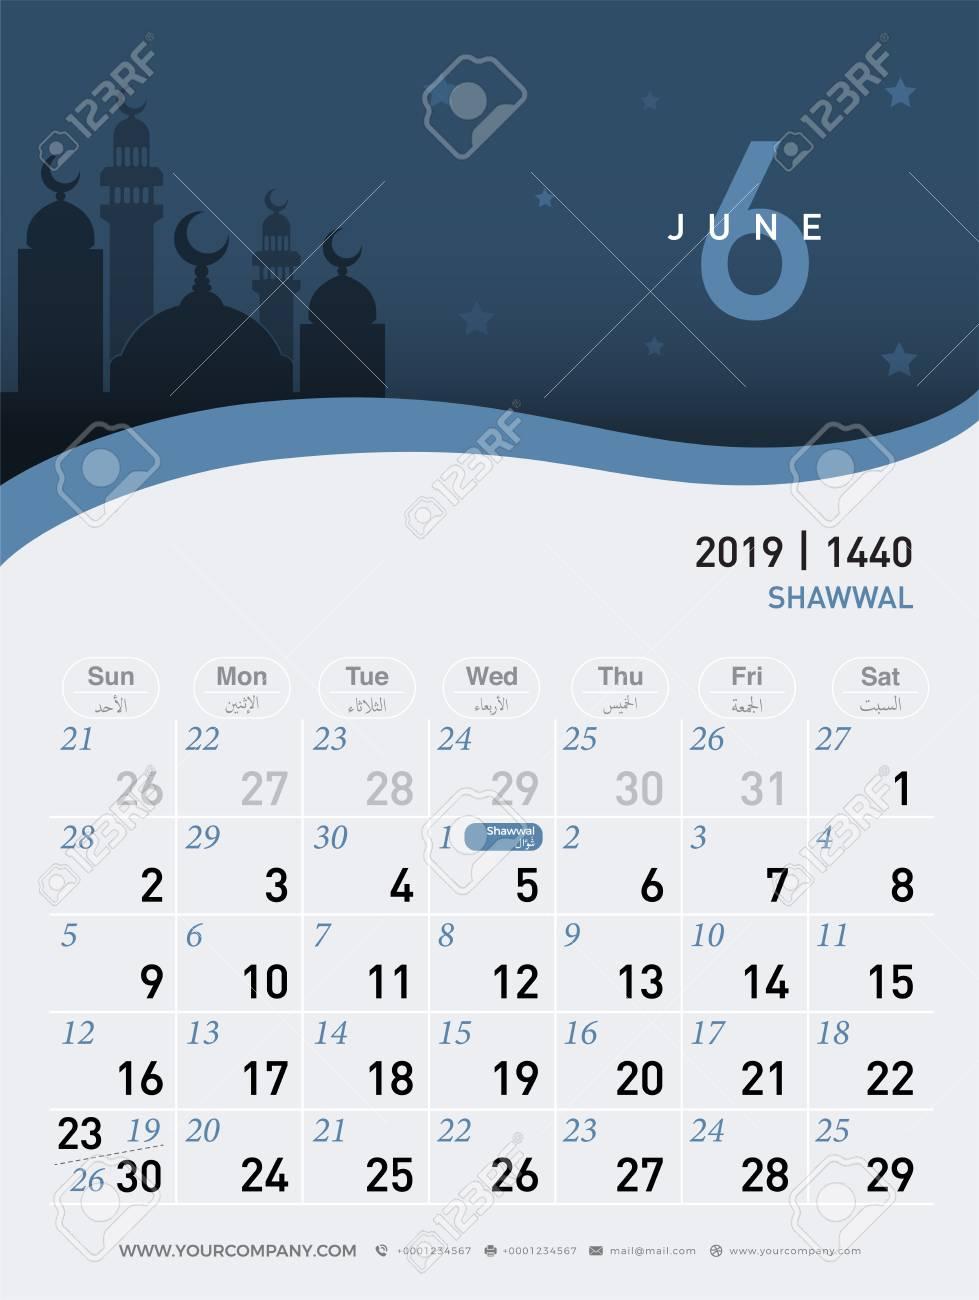 06 june calendar 2019  Hijri 1440 to 1441 islamic design template